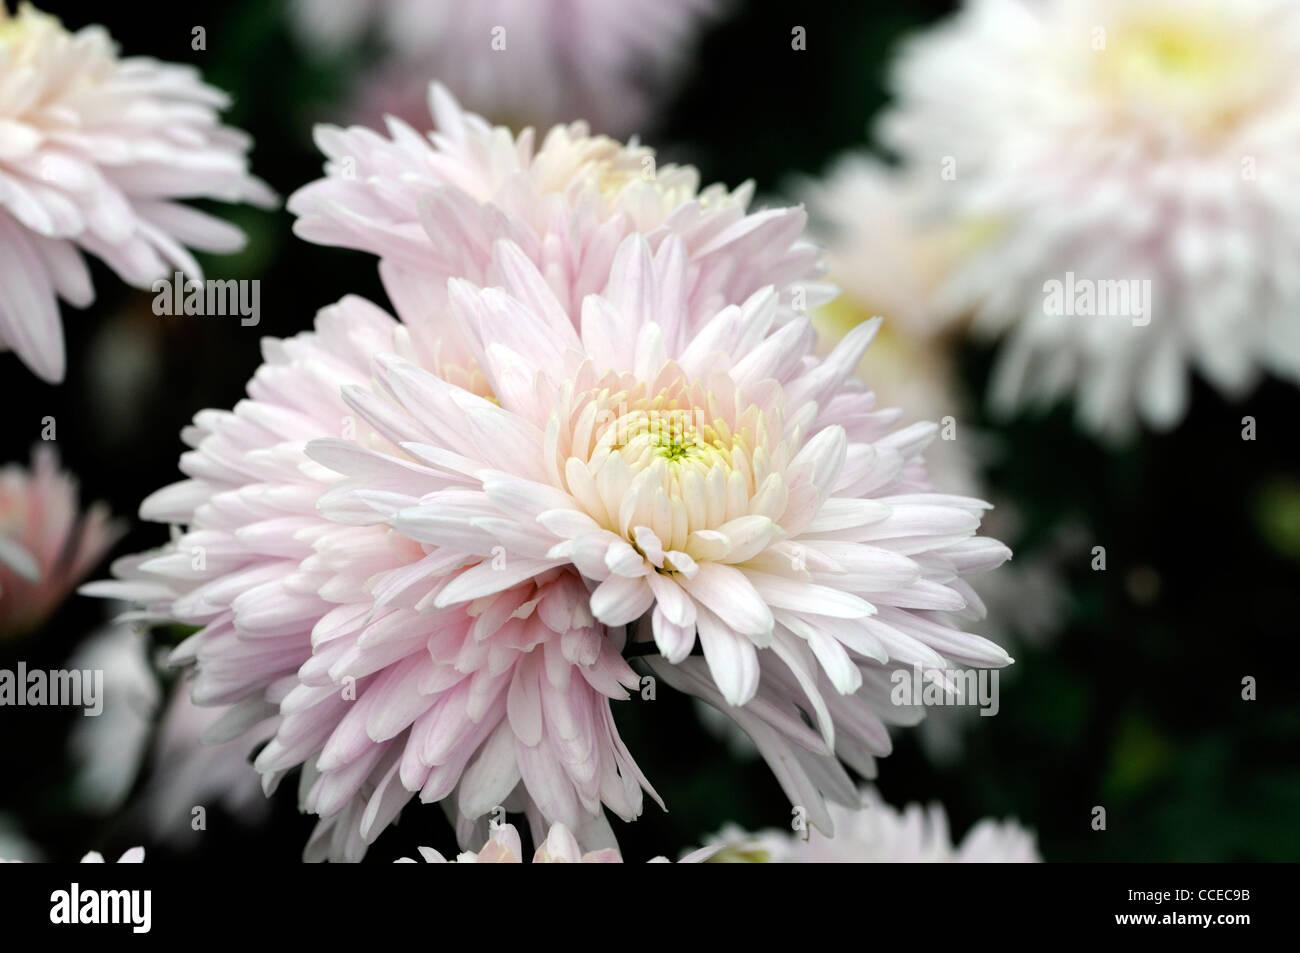 Cream Chrysanthemum Stock Photos Cream Chrysanthemum Stock Images